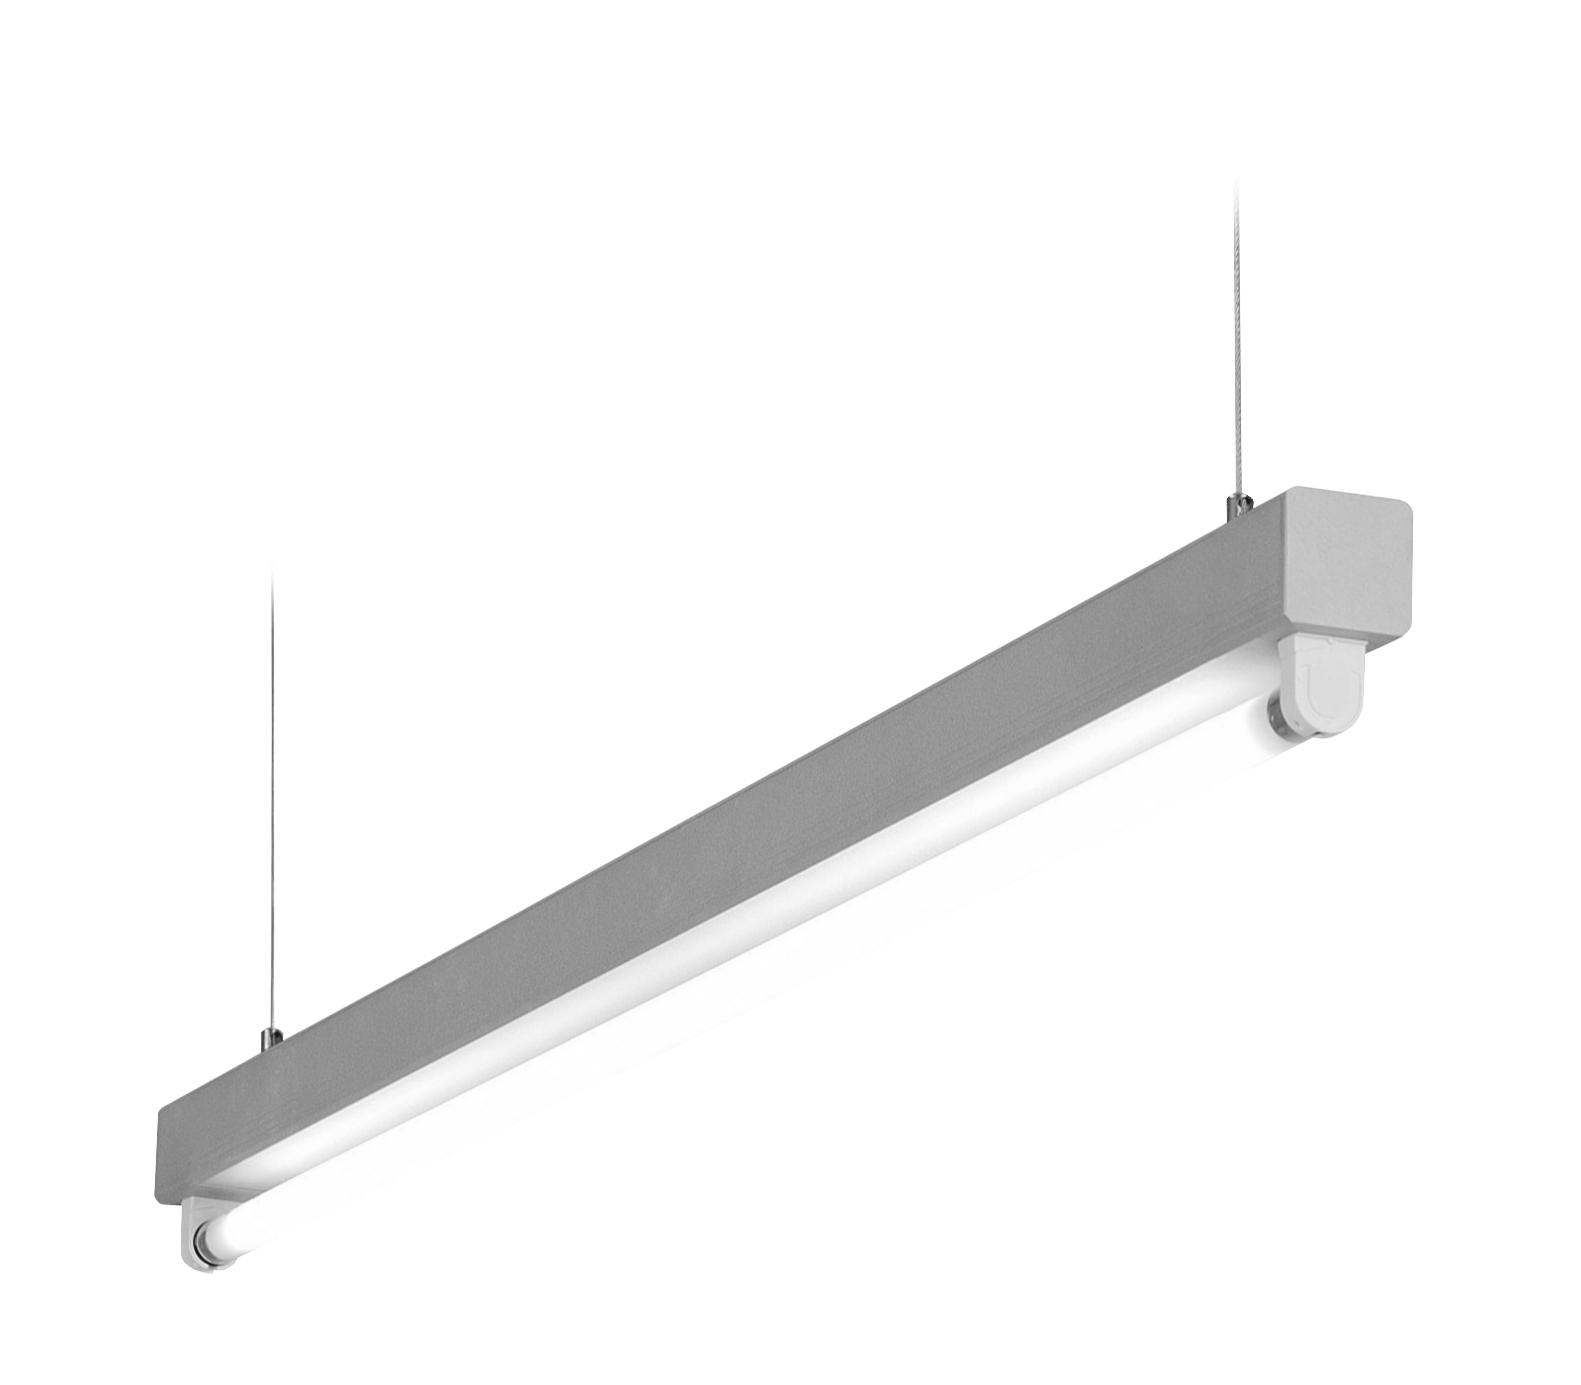 1 Stk Lucie T5 1x35/49/80W Aluminium Lichtleiste, QTI EVG LI38LUC180